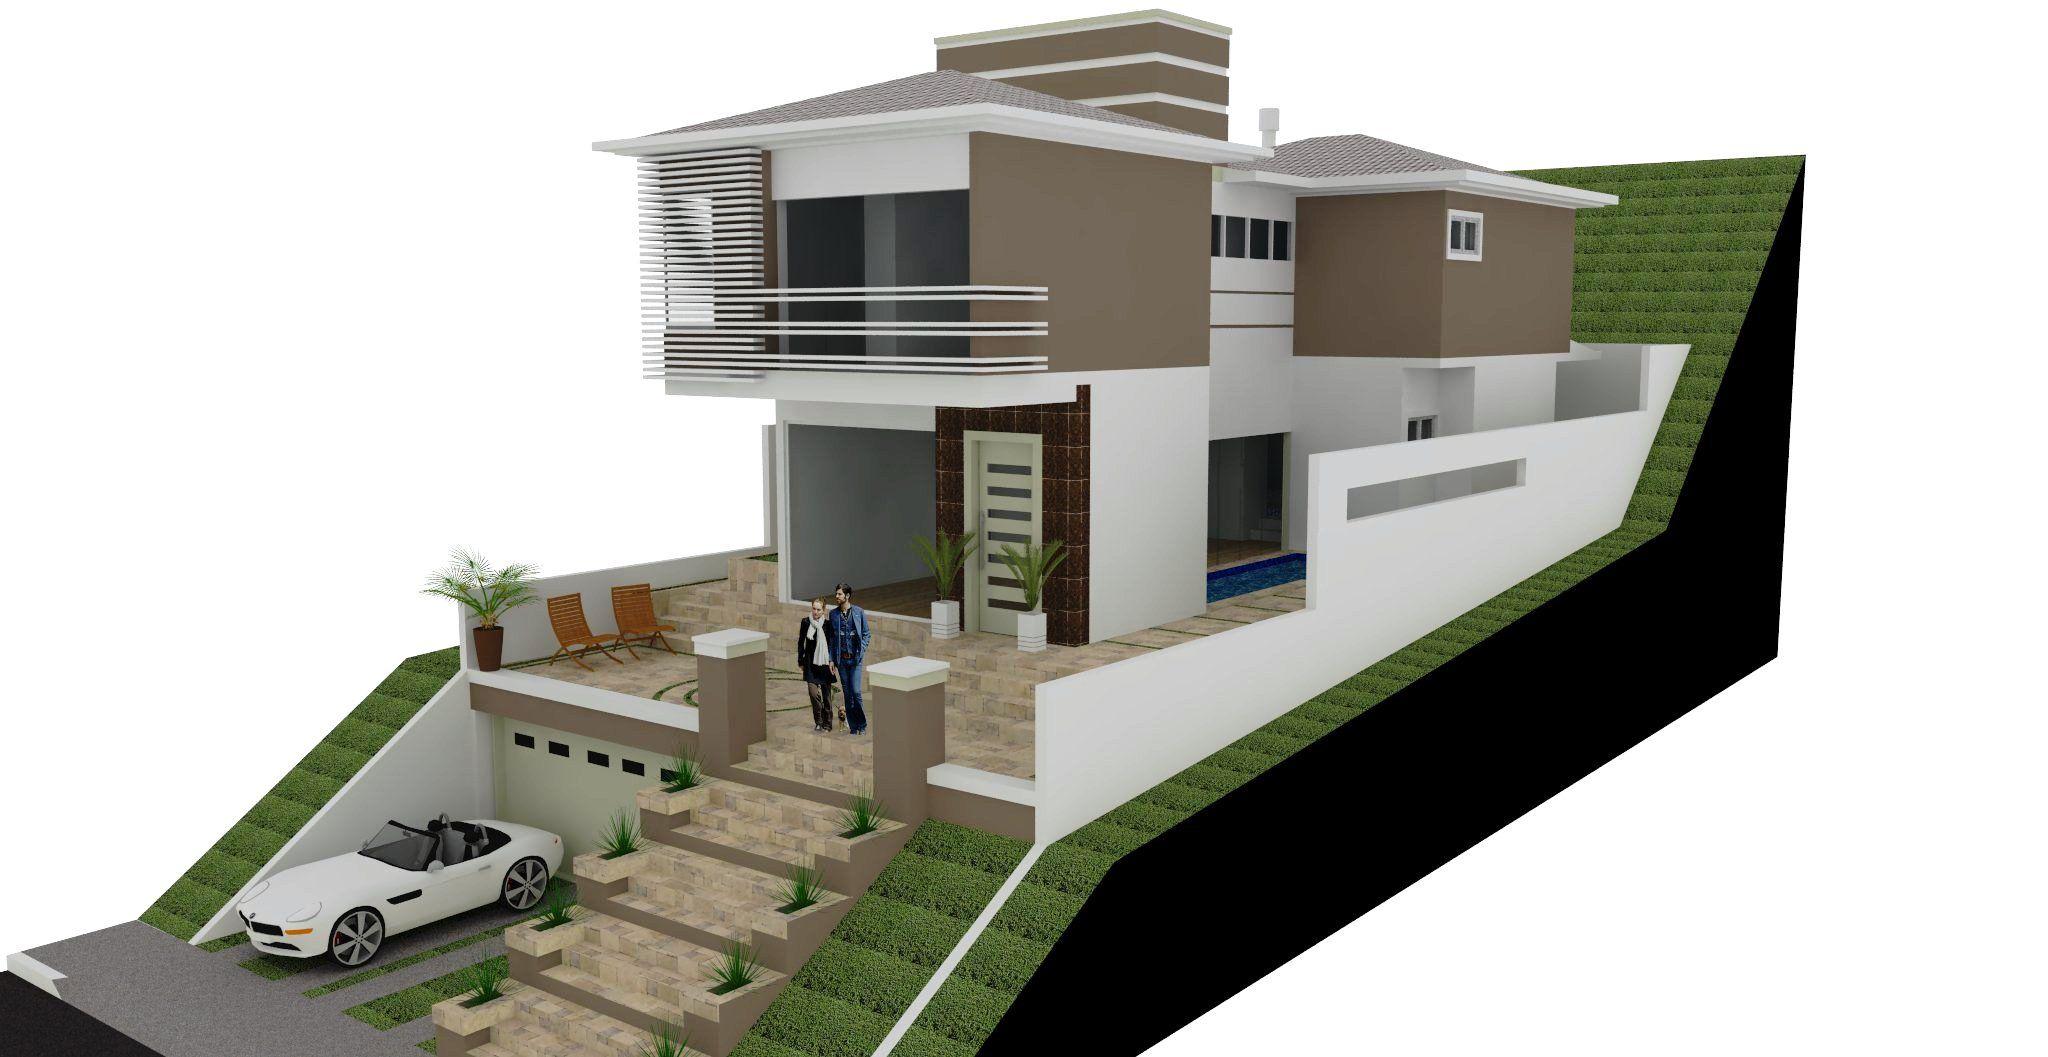 Guilherme site 2 048 1 057 p xeles casa ximena for Casa design manzano